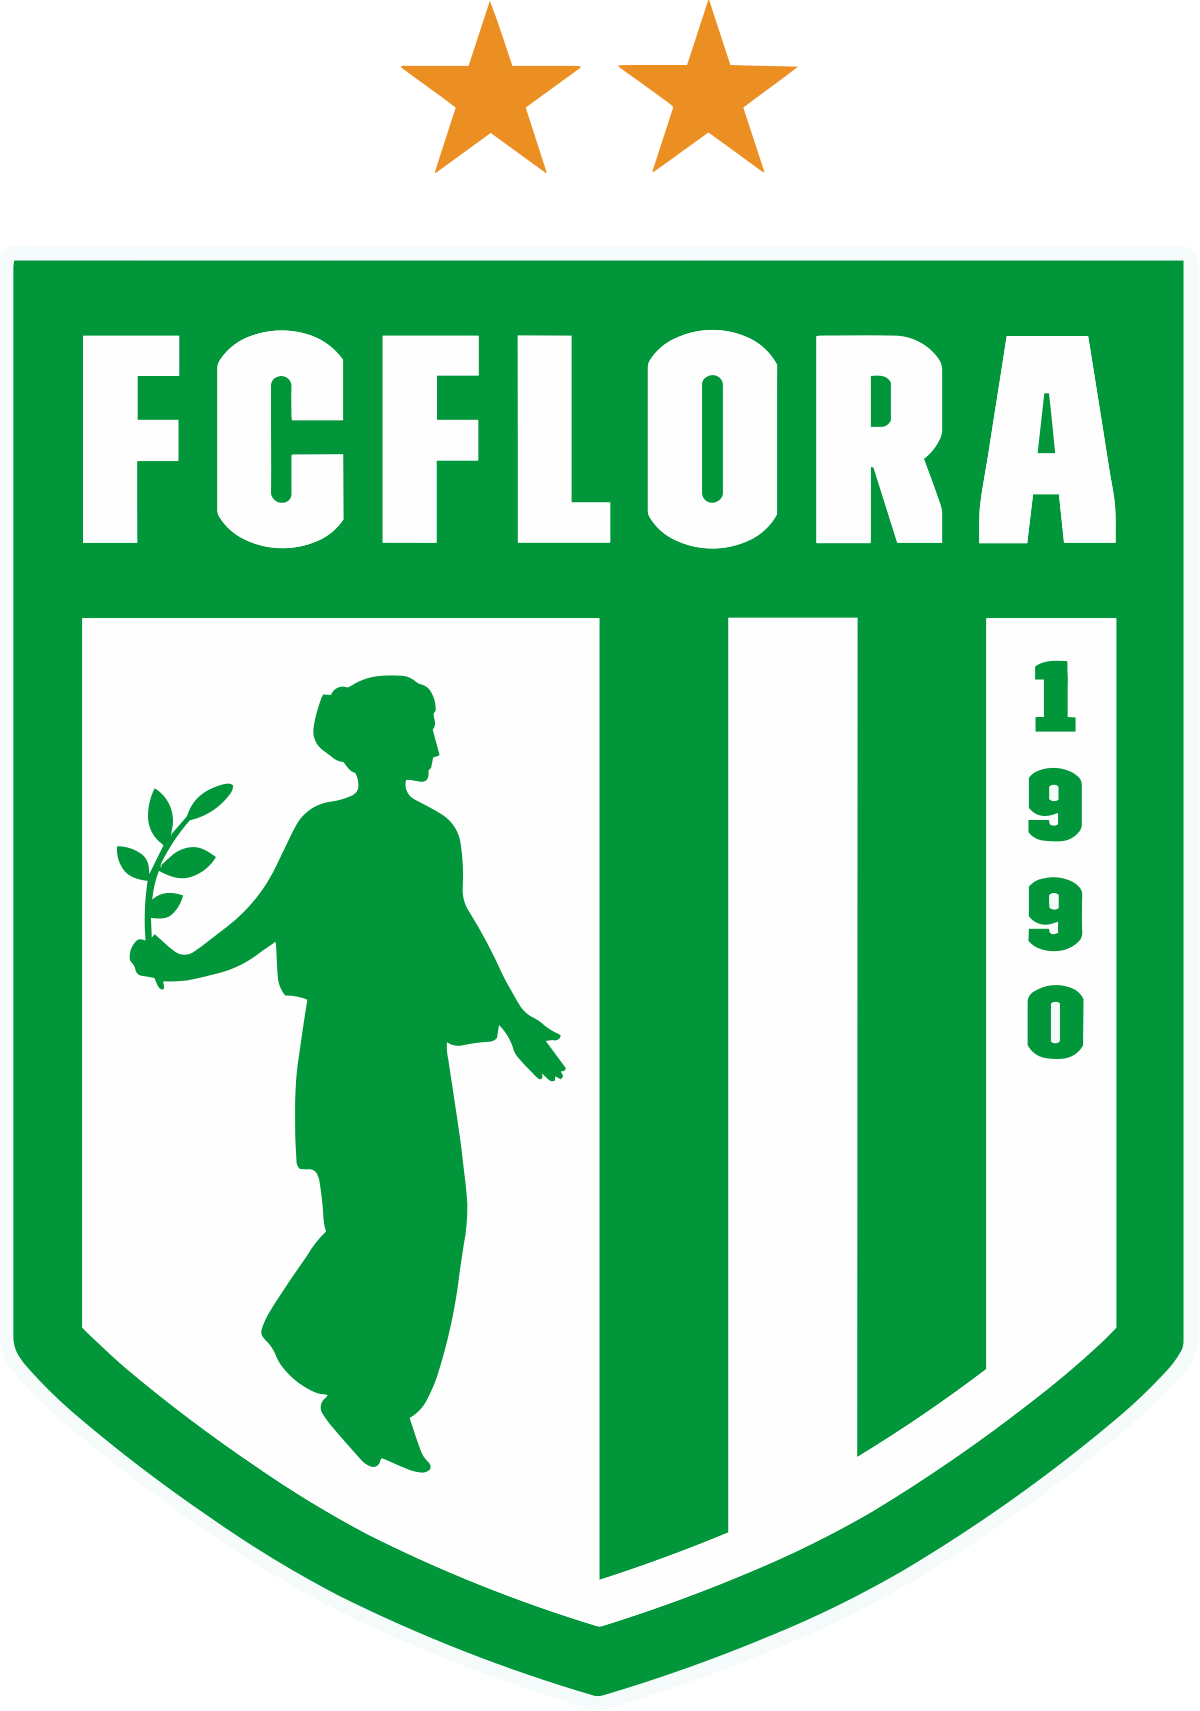 Flora Tallinn II team logo